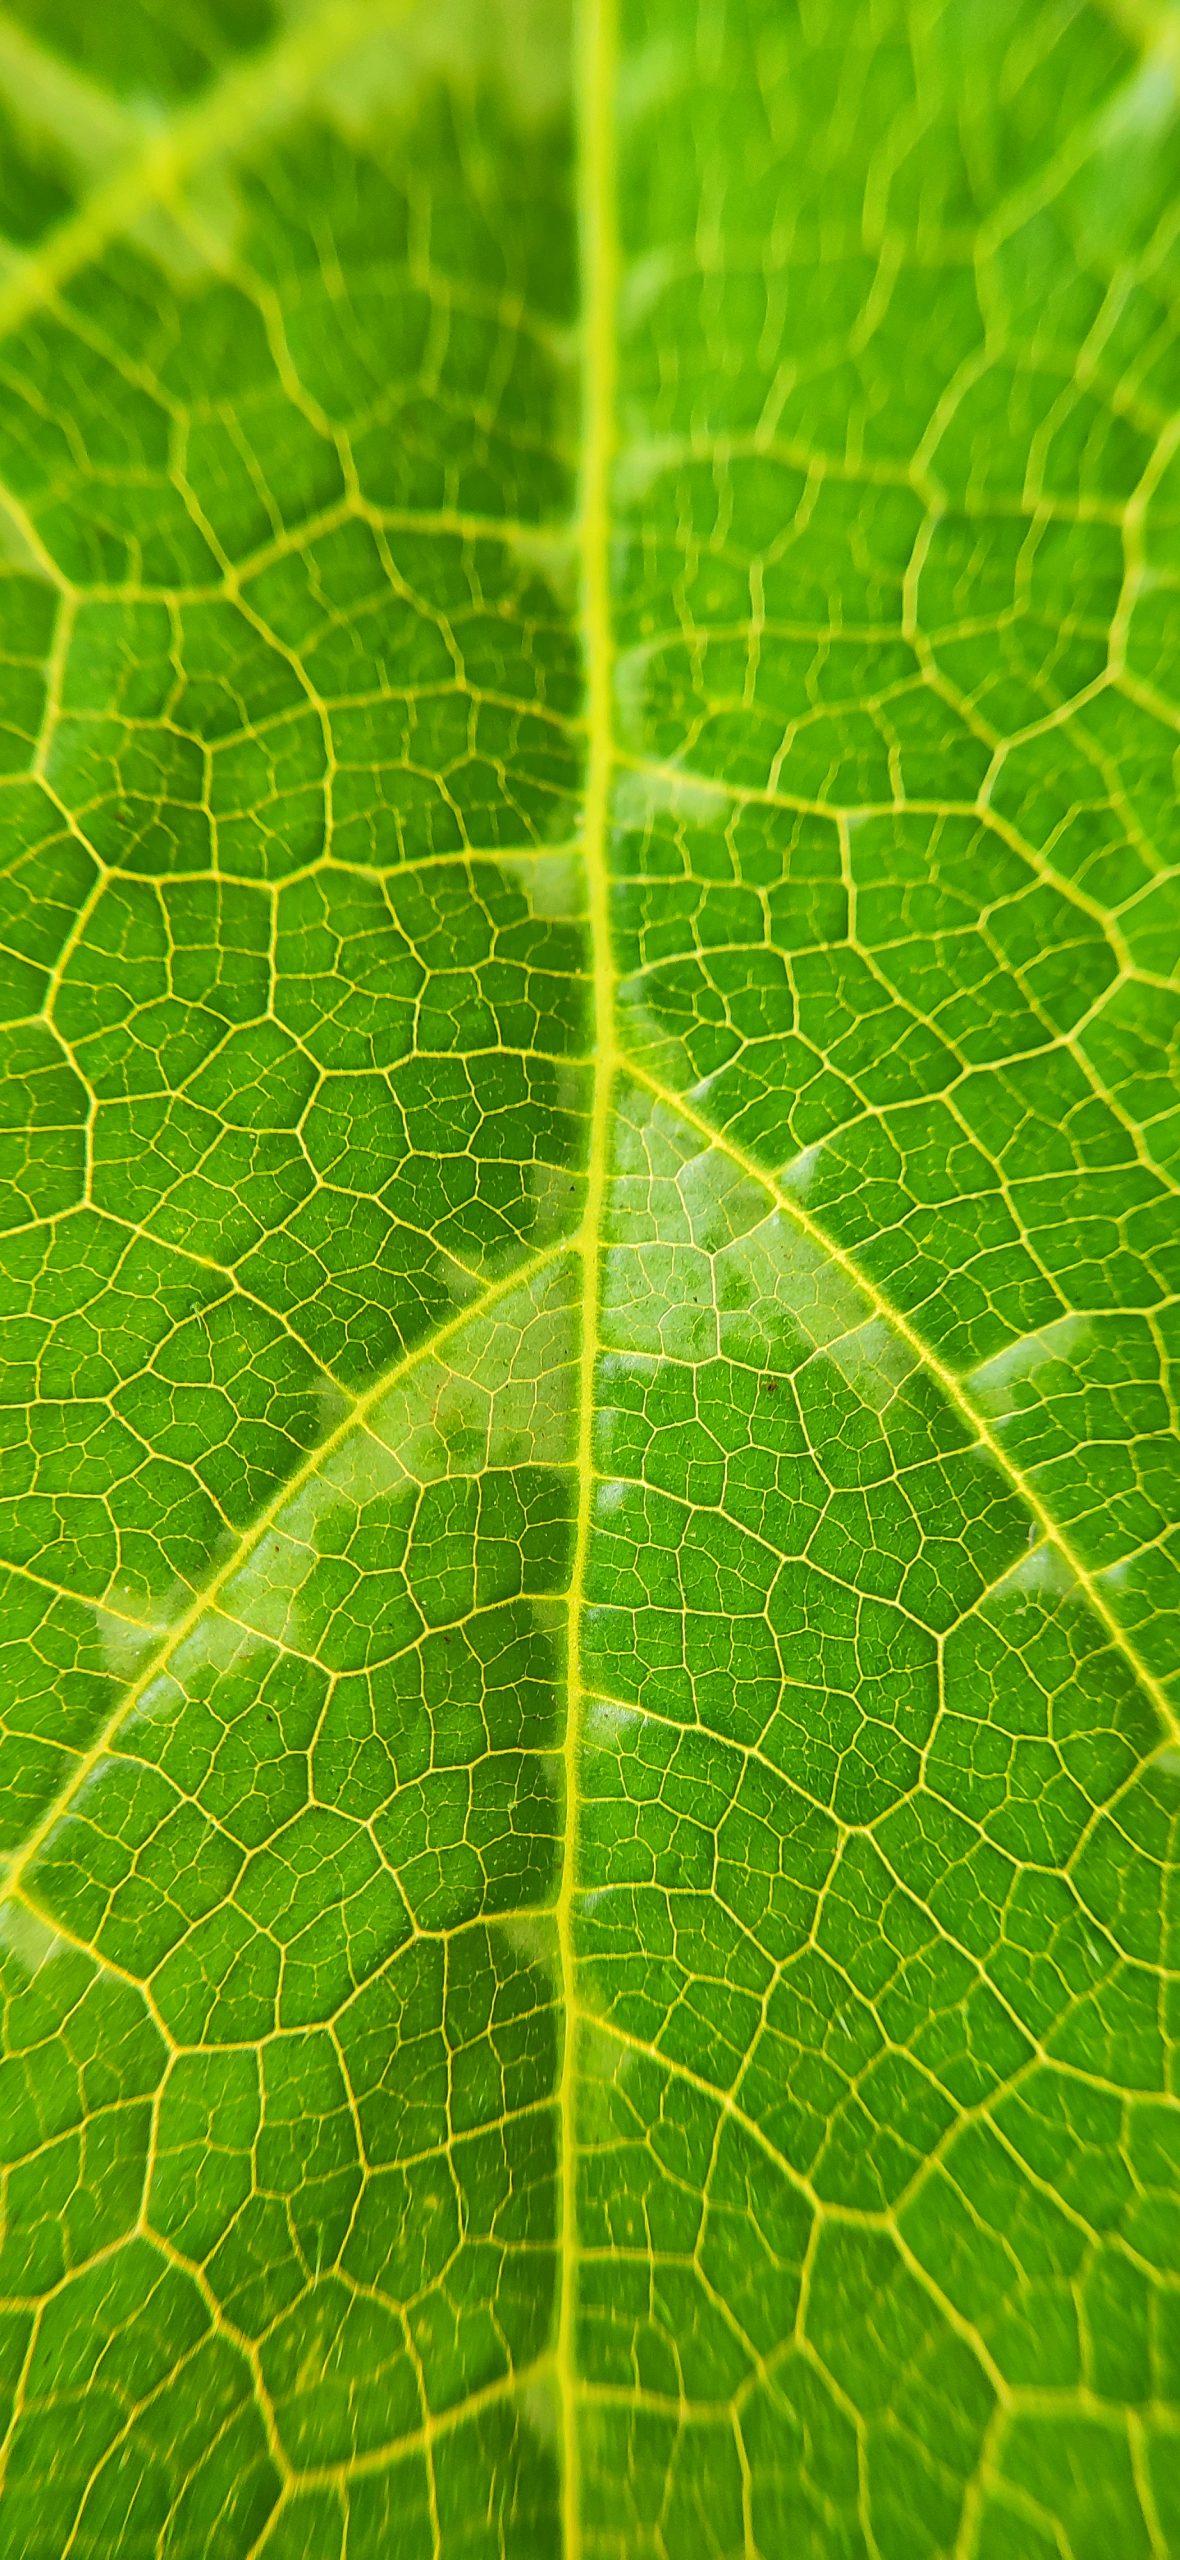 Close of a plant leaf